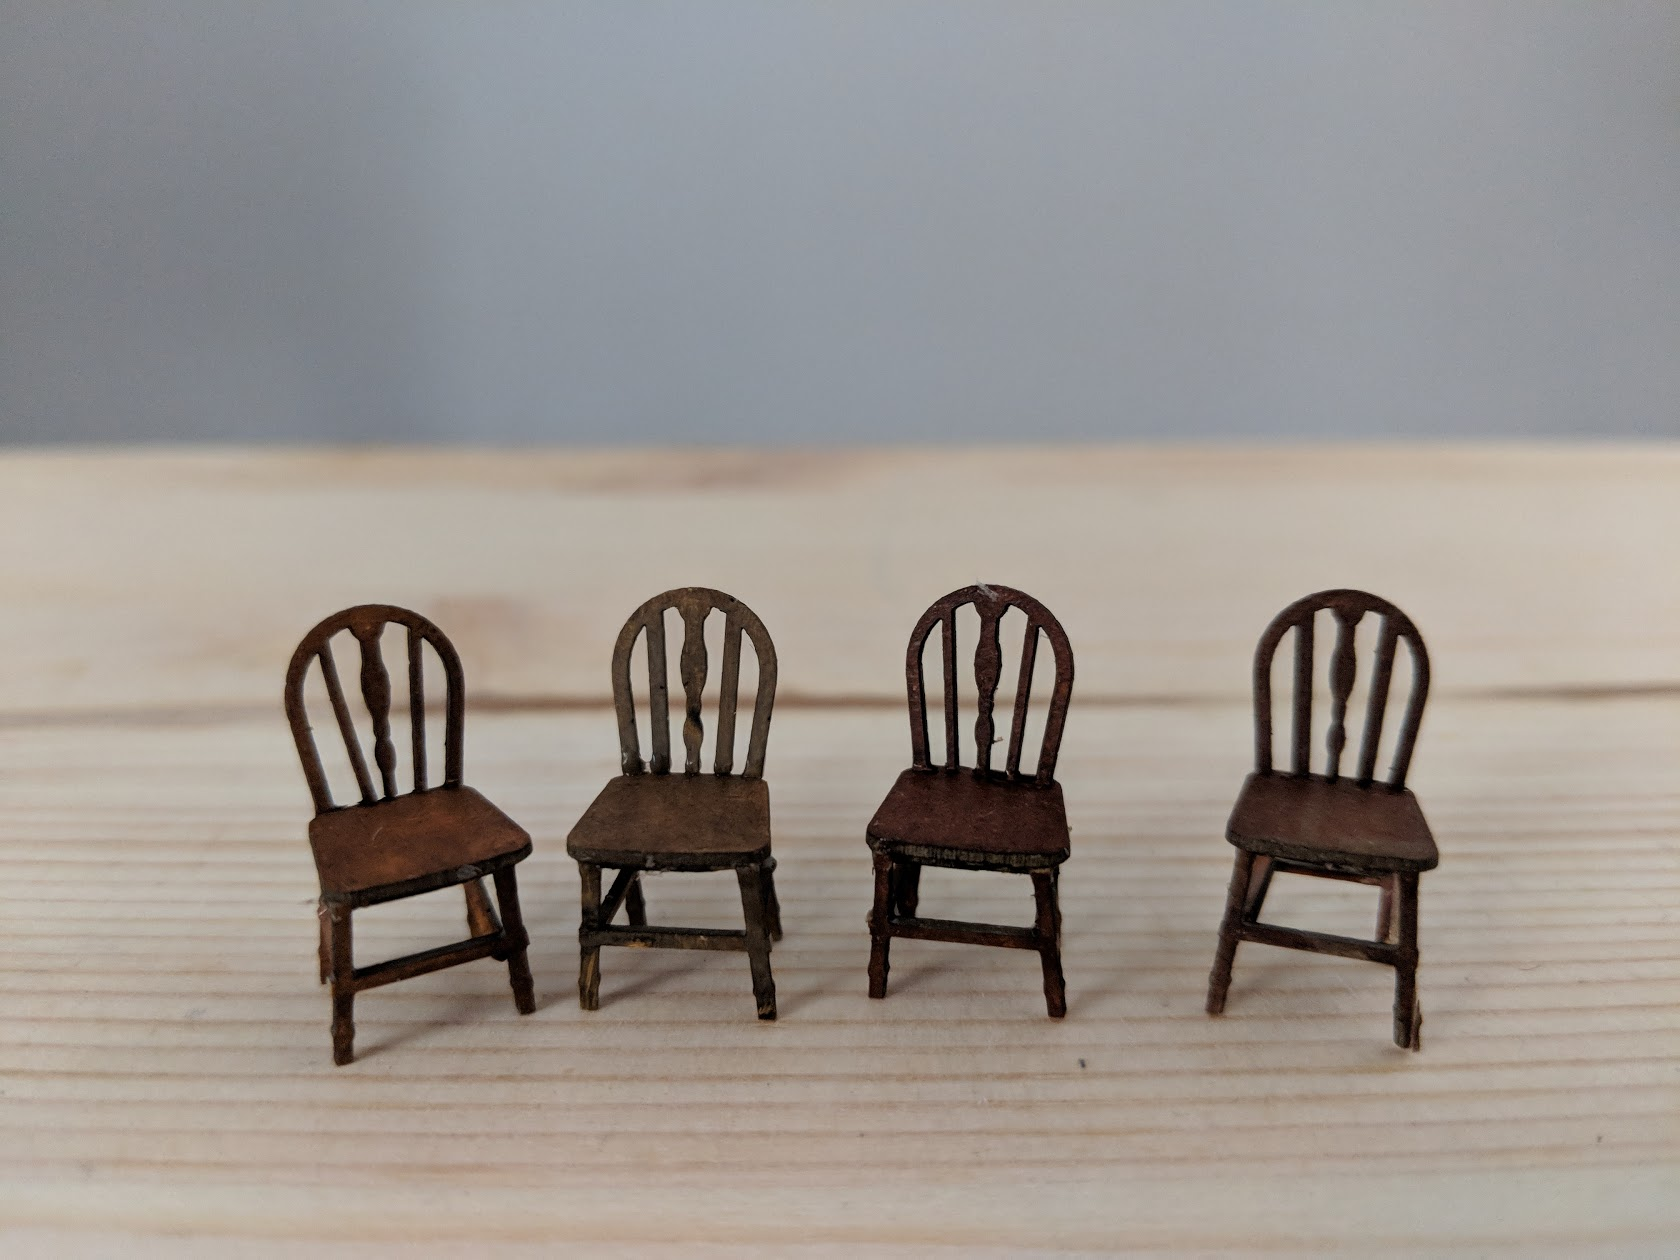 Laser-cut chairs